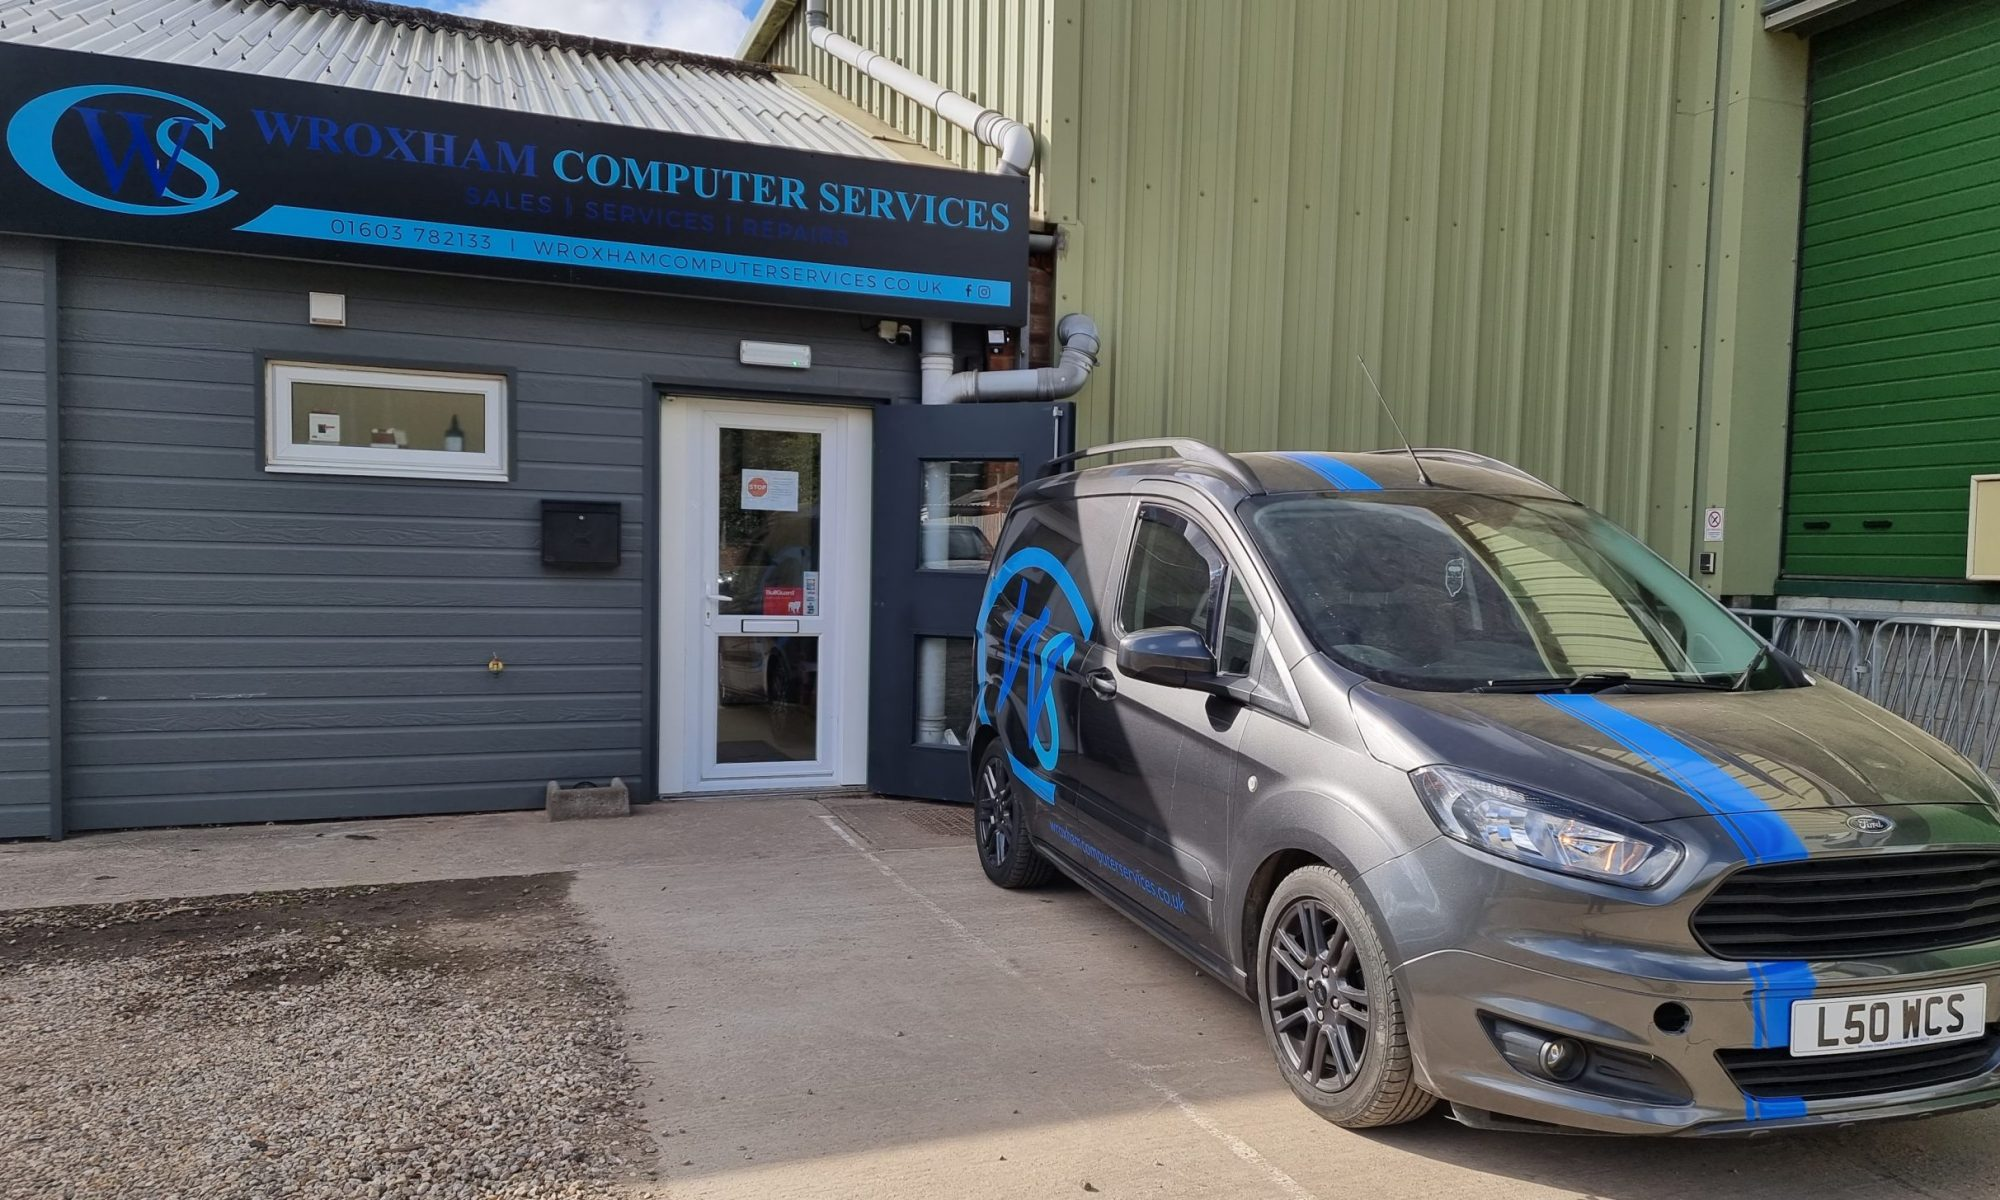 Wroxham Computer Services Ltd